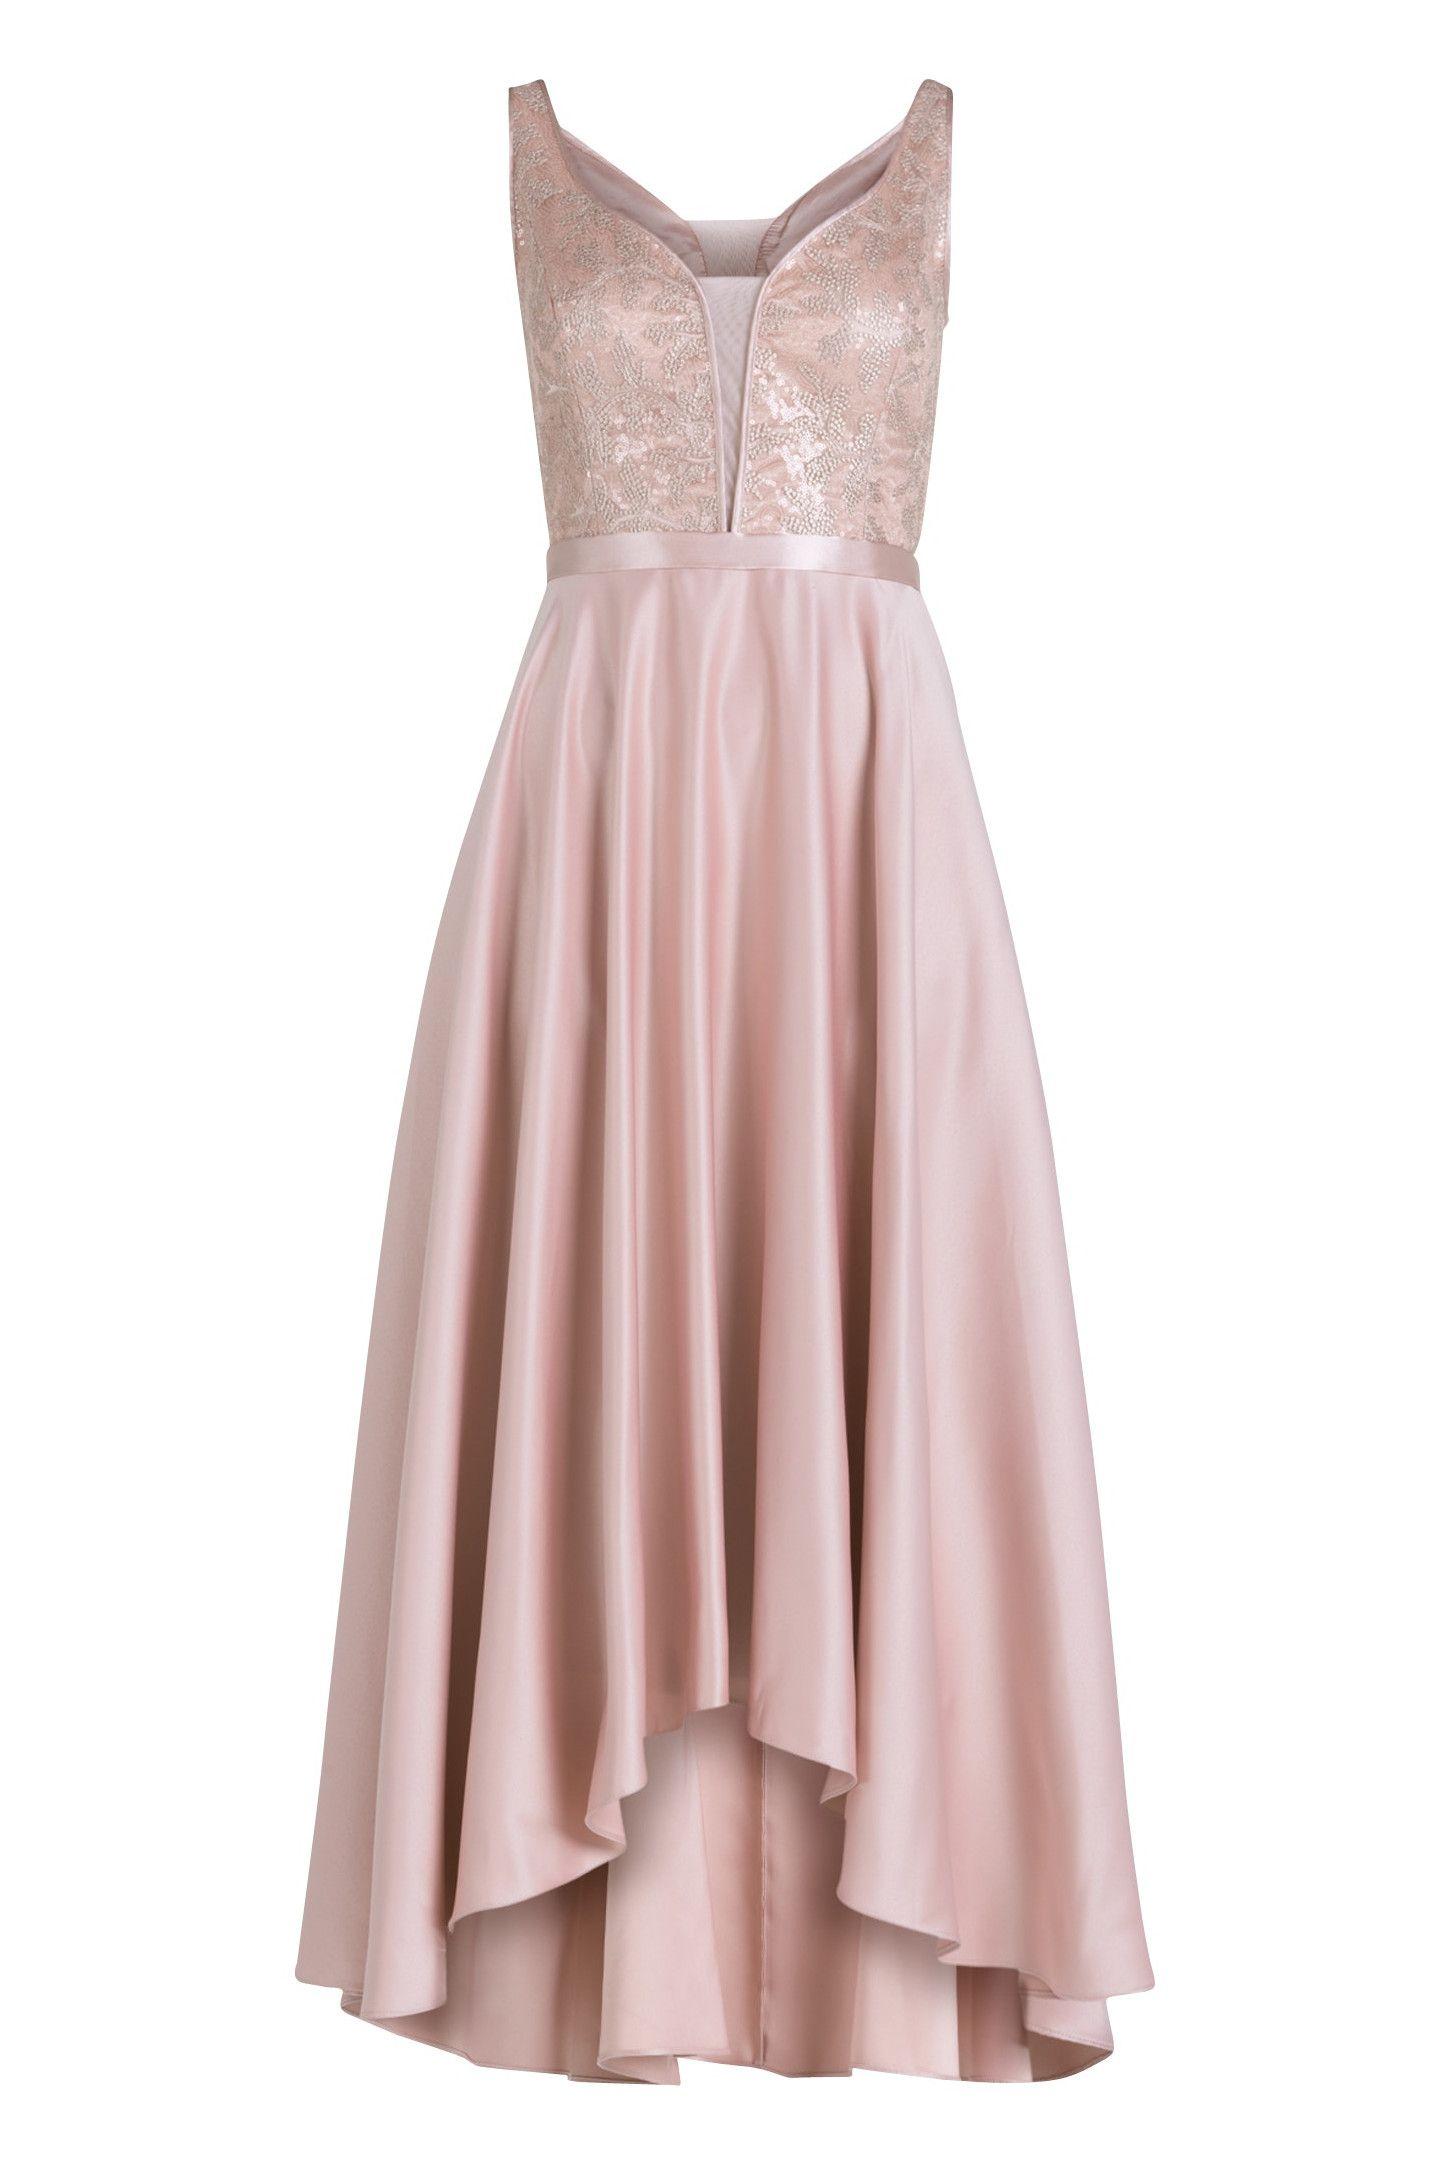 Ausgefallenes Abendkleid im Vokuhila Style.  Vokuhila kleid